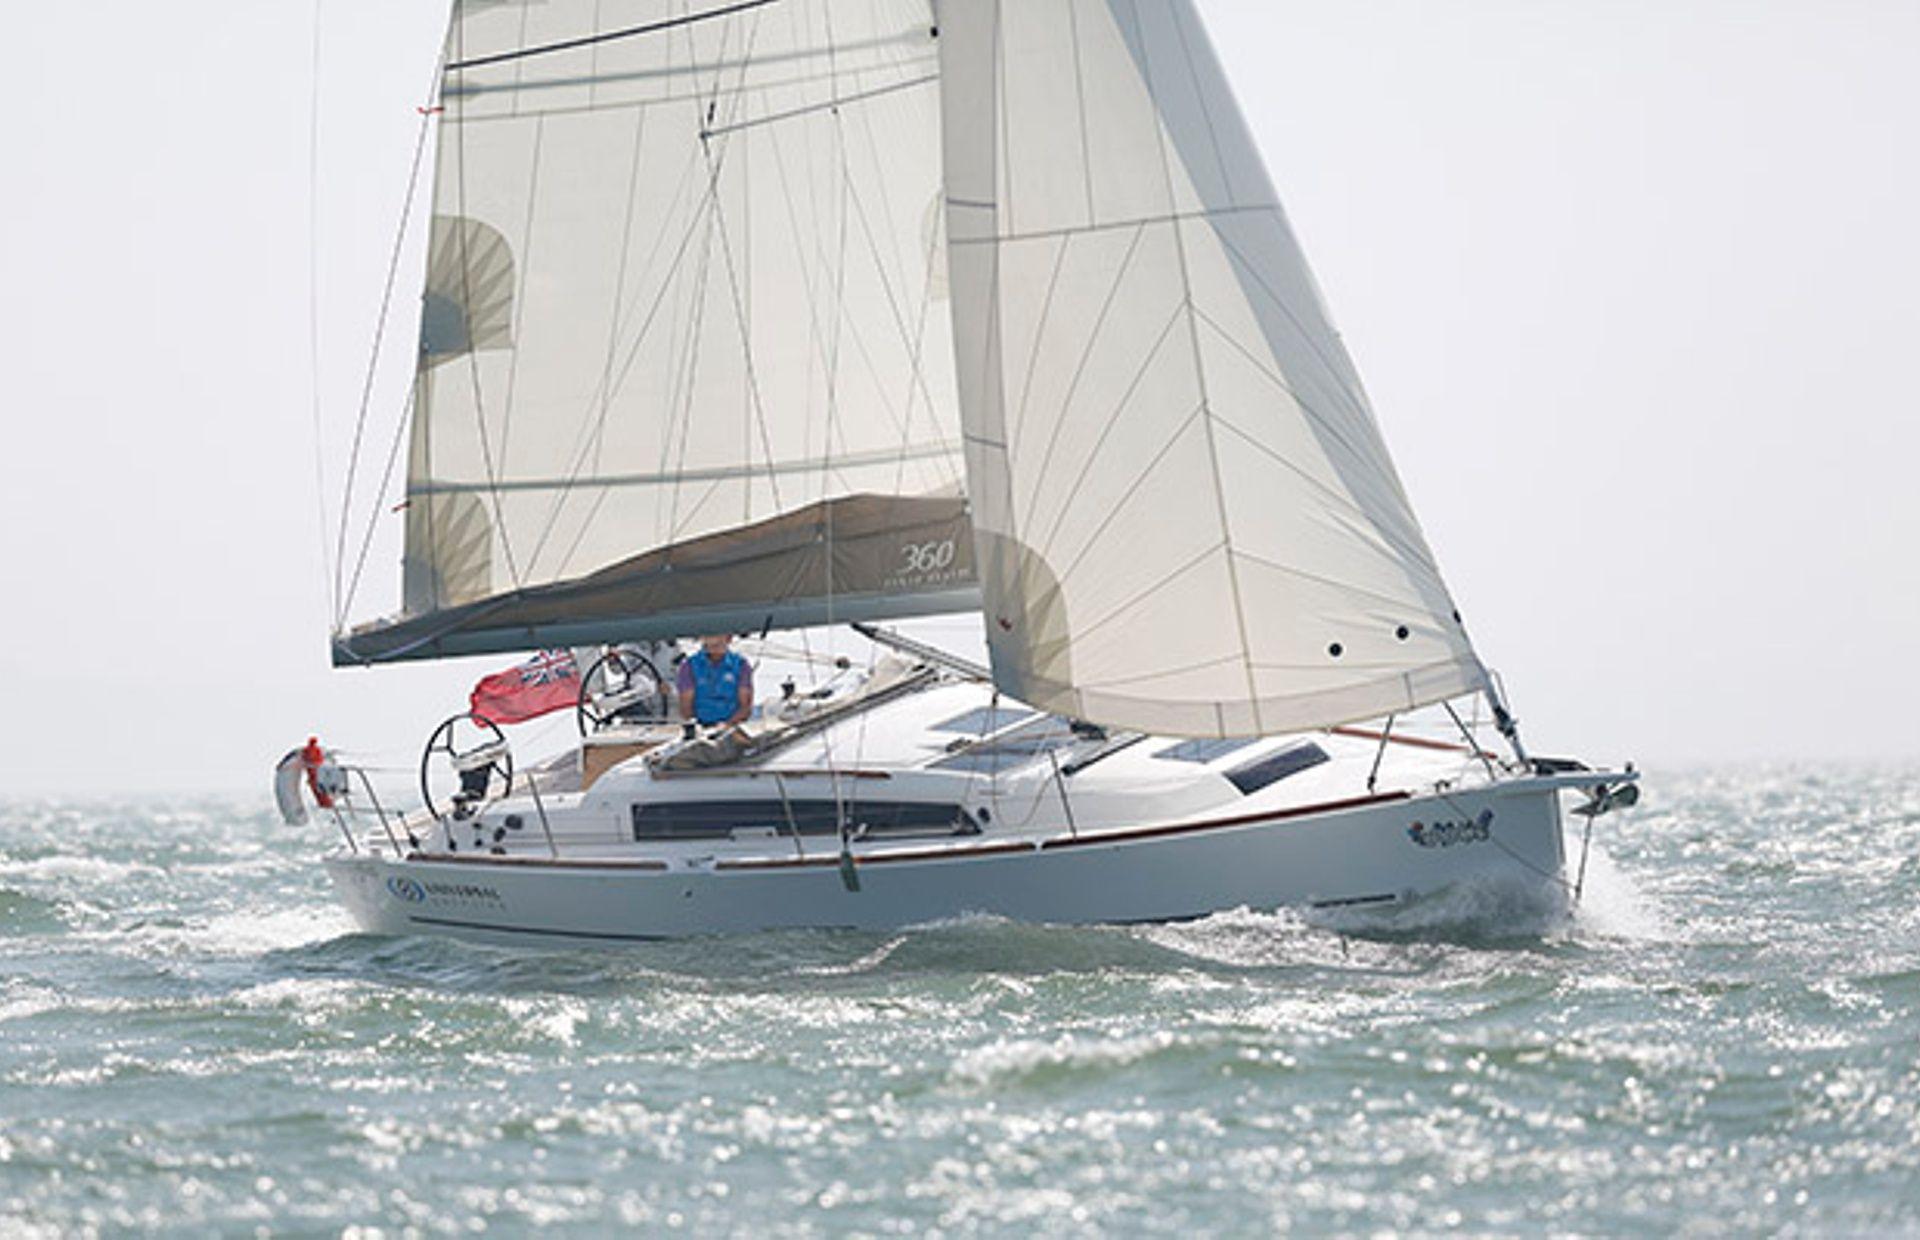 https://media.insailing.com/boat/dufour-360/image_1572347206442.jpg